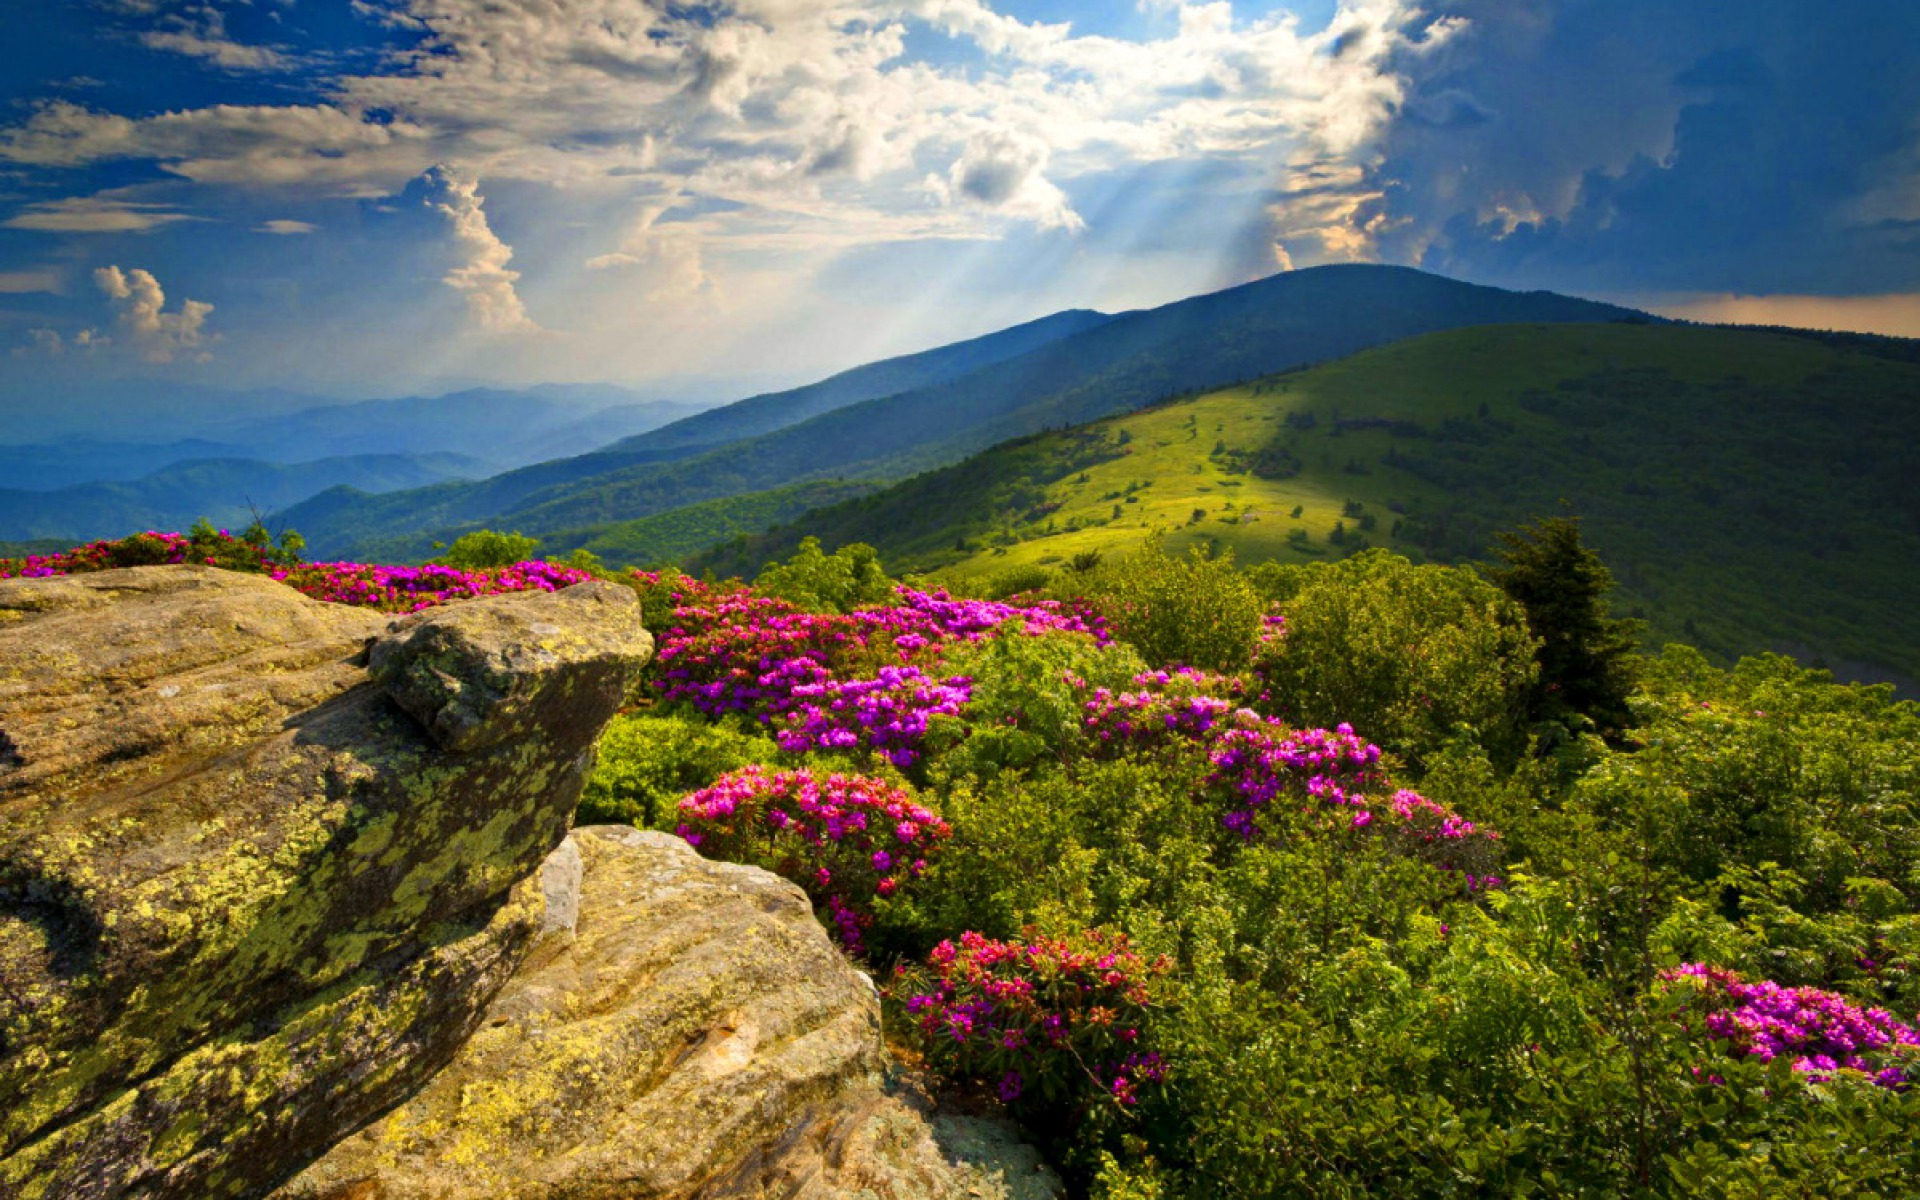 appalachian blue ridge mountains wallpaper - photo #32